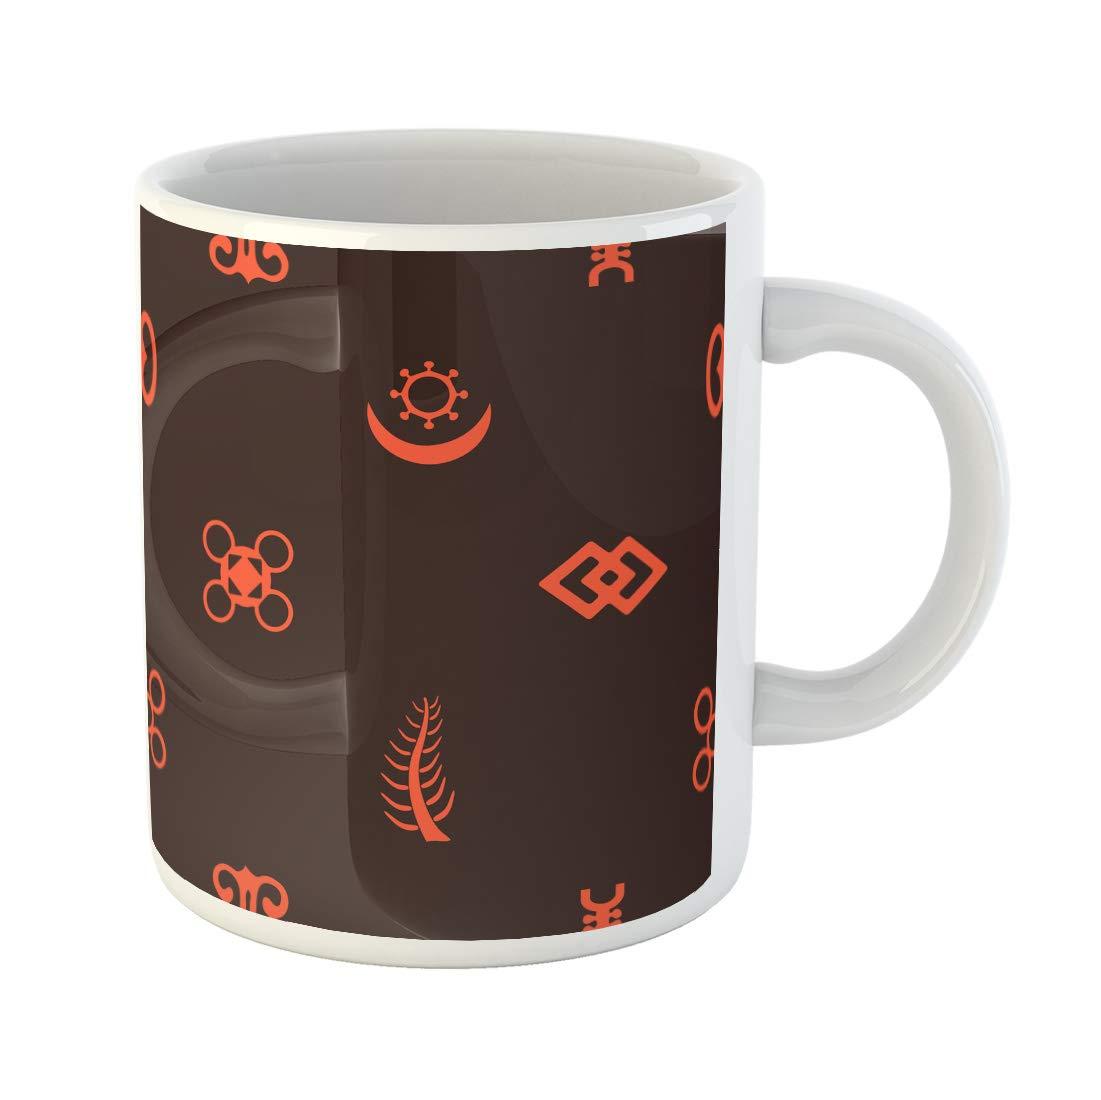 Funny coffee mug clipart jpg freeuse stock Amazon.com   Semtomn Funny Coffee Mug Africa Adinkra Symbols African ... jpg freeuse stock